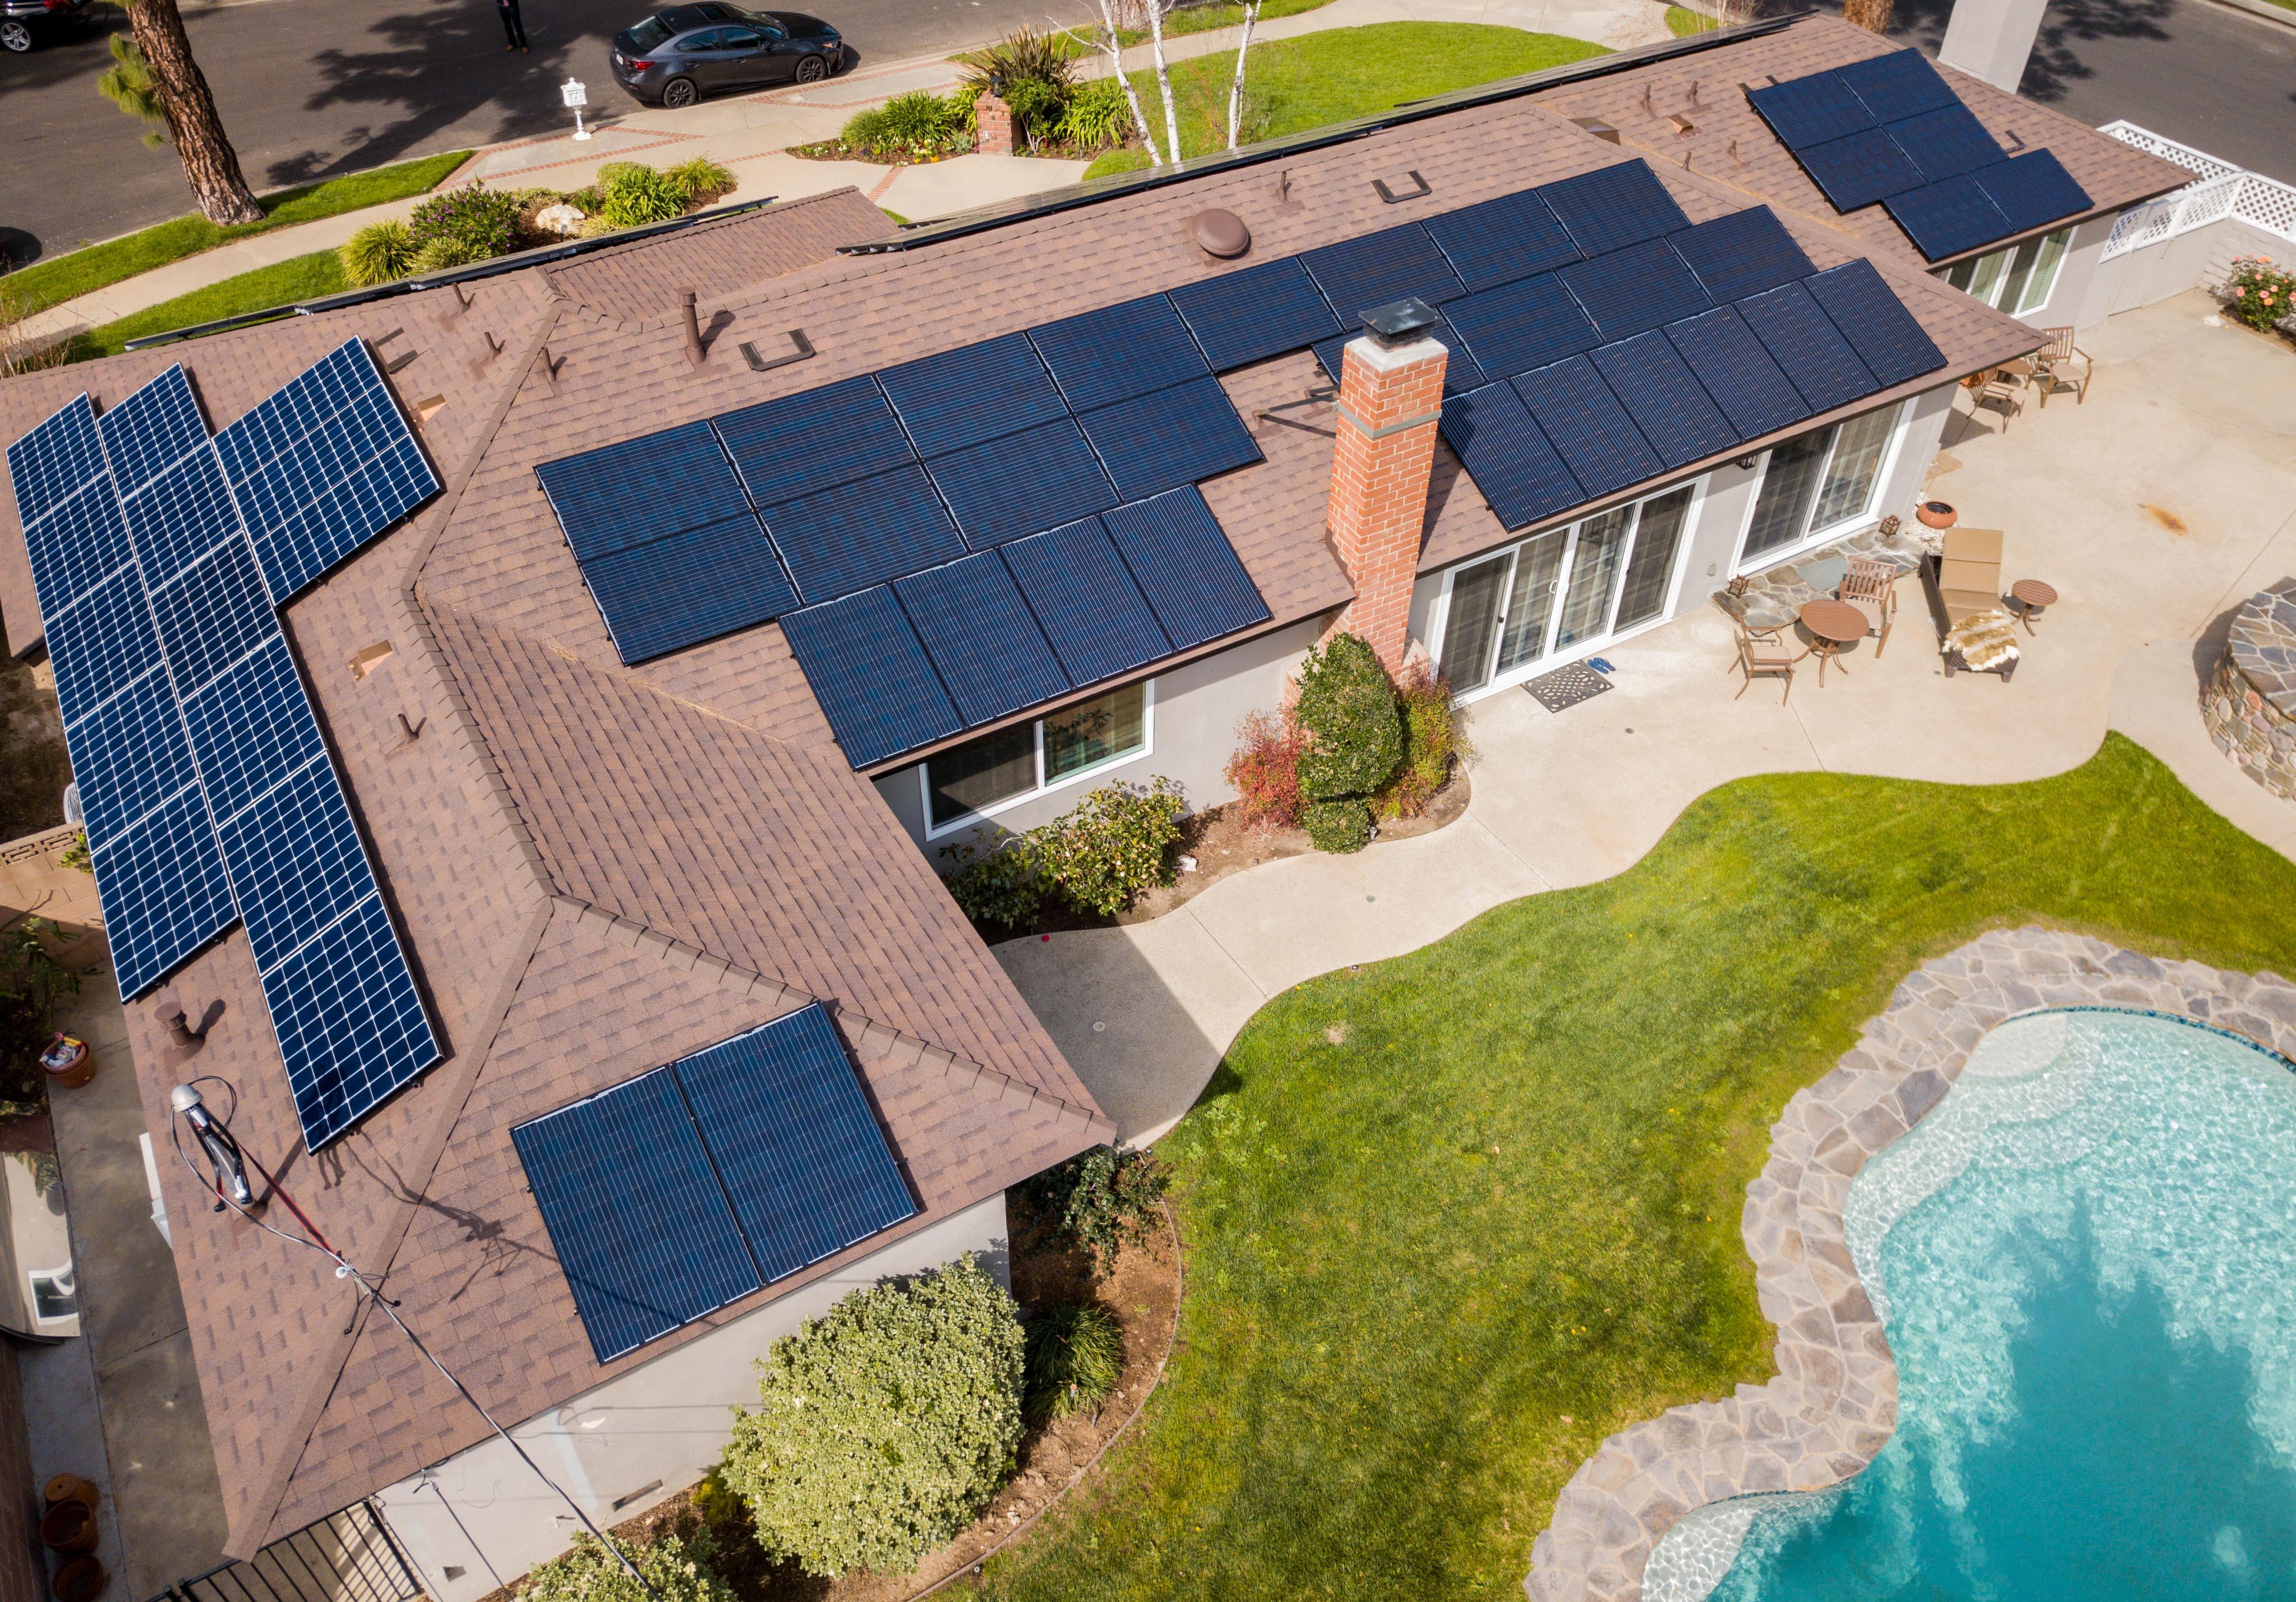 5kW / Shingle Roof / Premium Panels